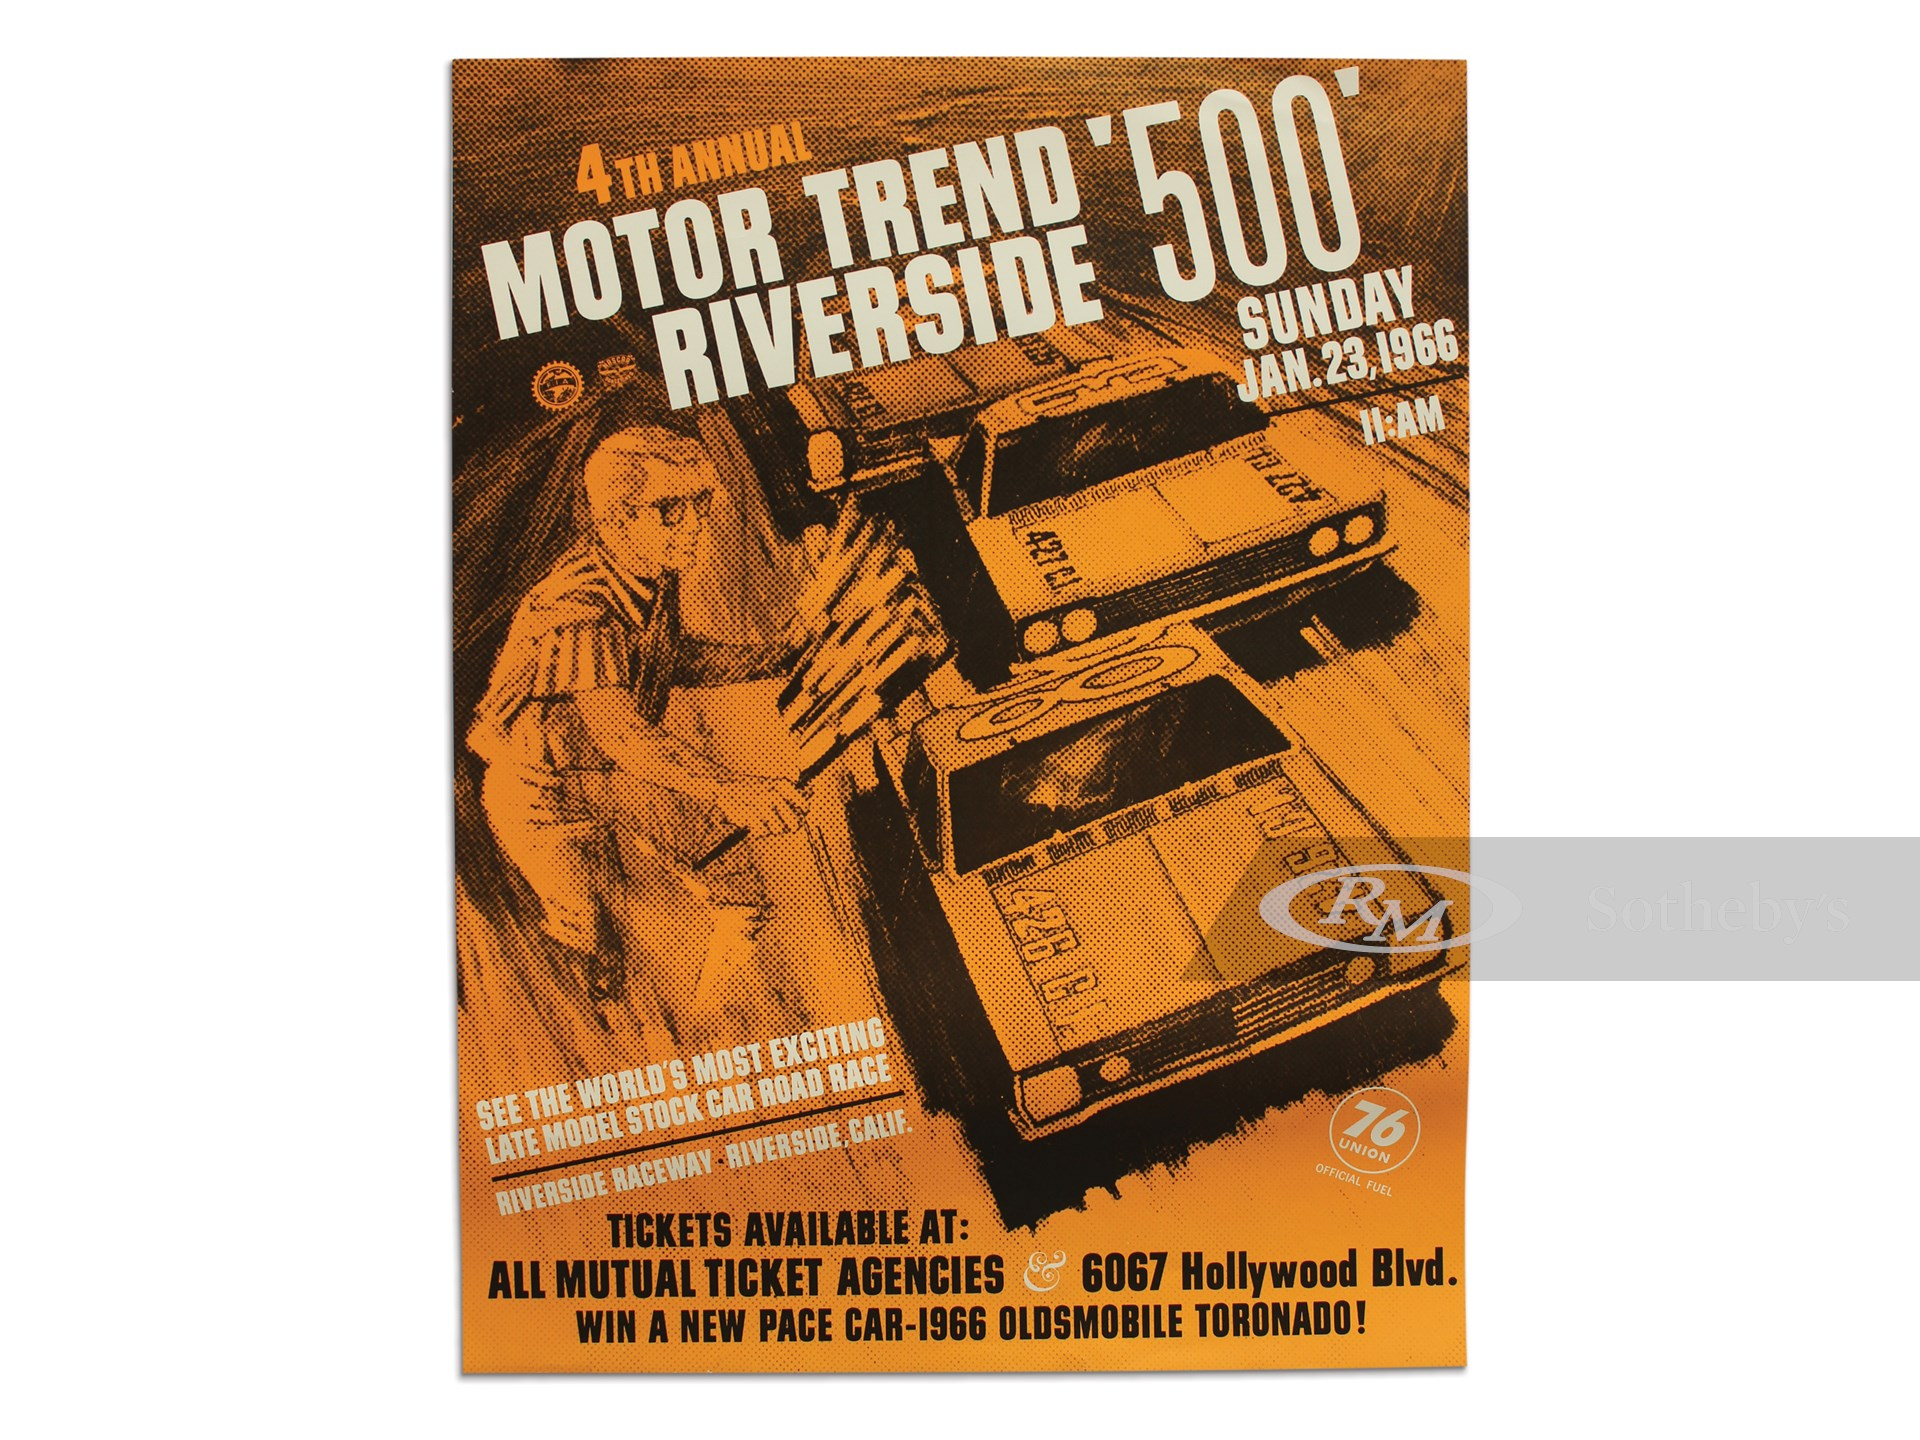 """4th Annual Motor Trend Riverside '500' Sunday Jan. 23, 1966"" Vintage Event Poster -"